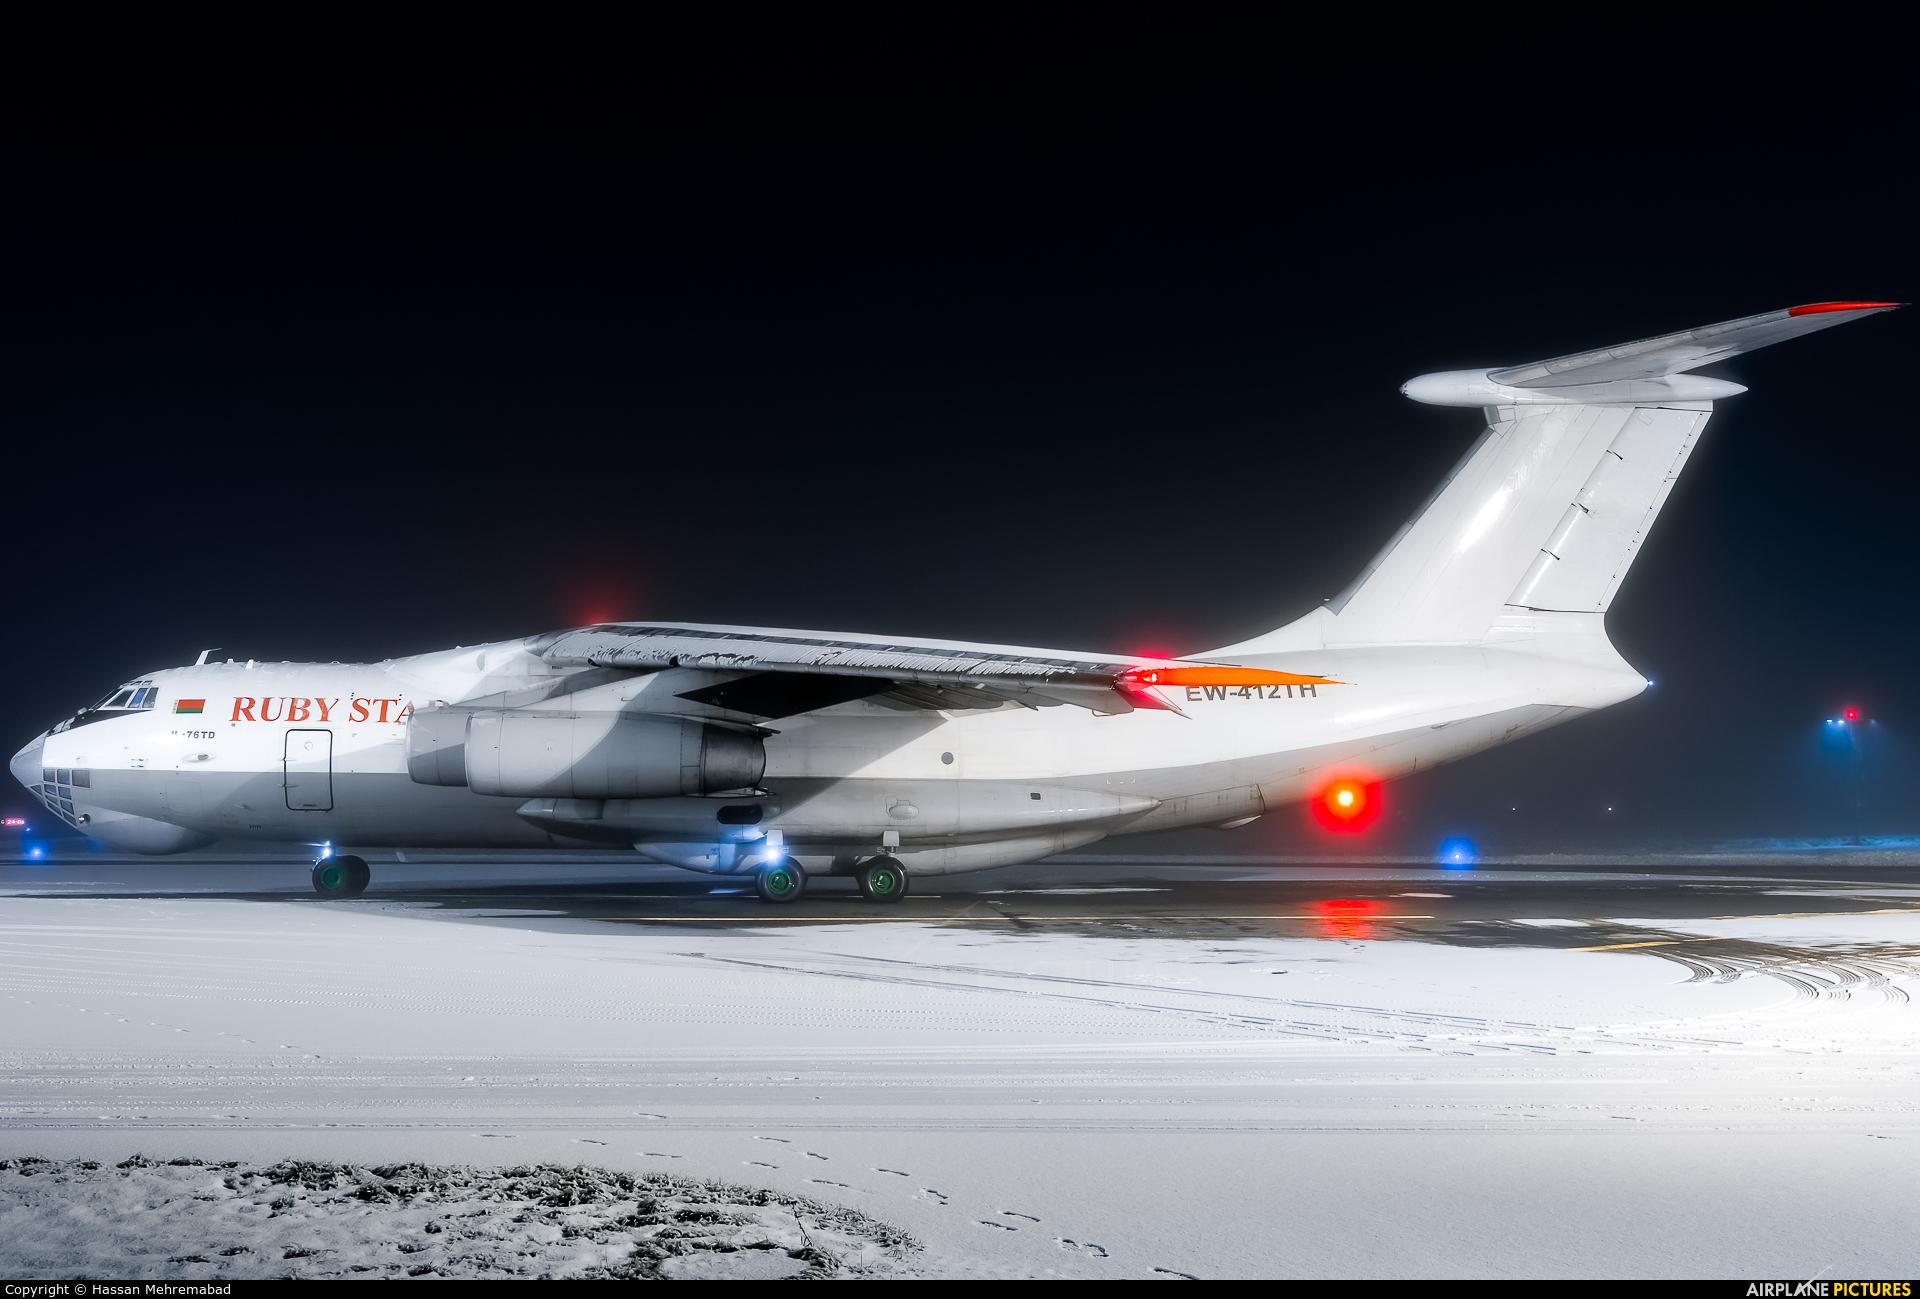 Ruby Star Air Enterprise EW-412TH aircraft at Tampere-Pirkkala